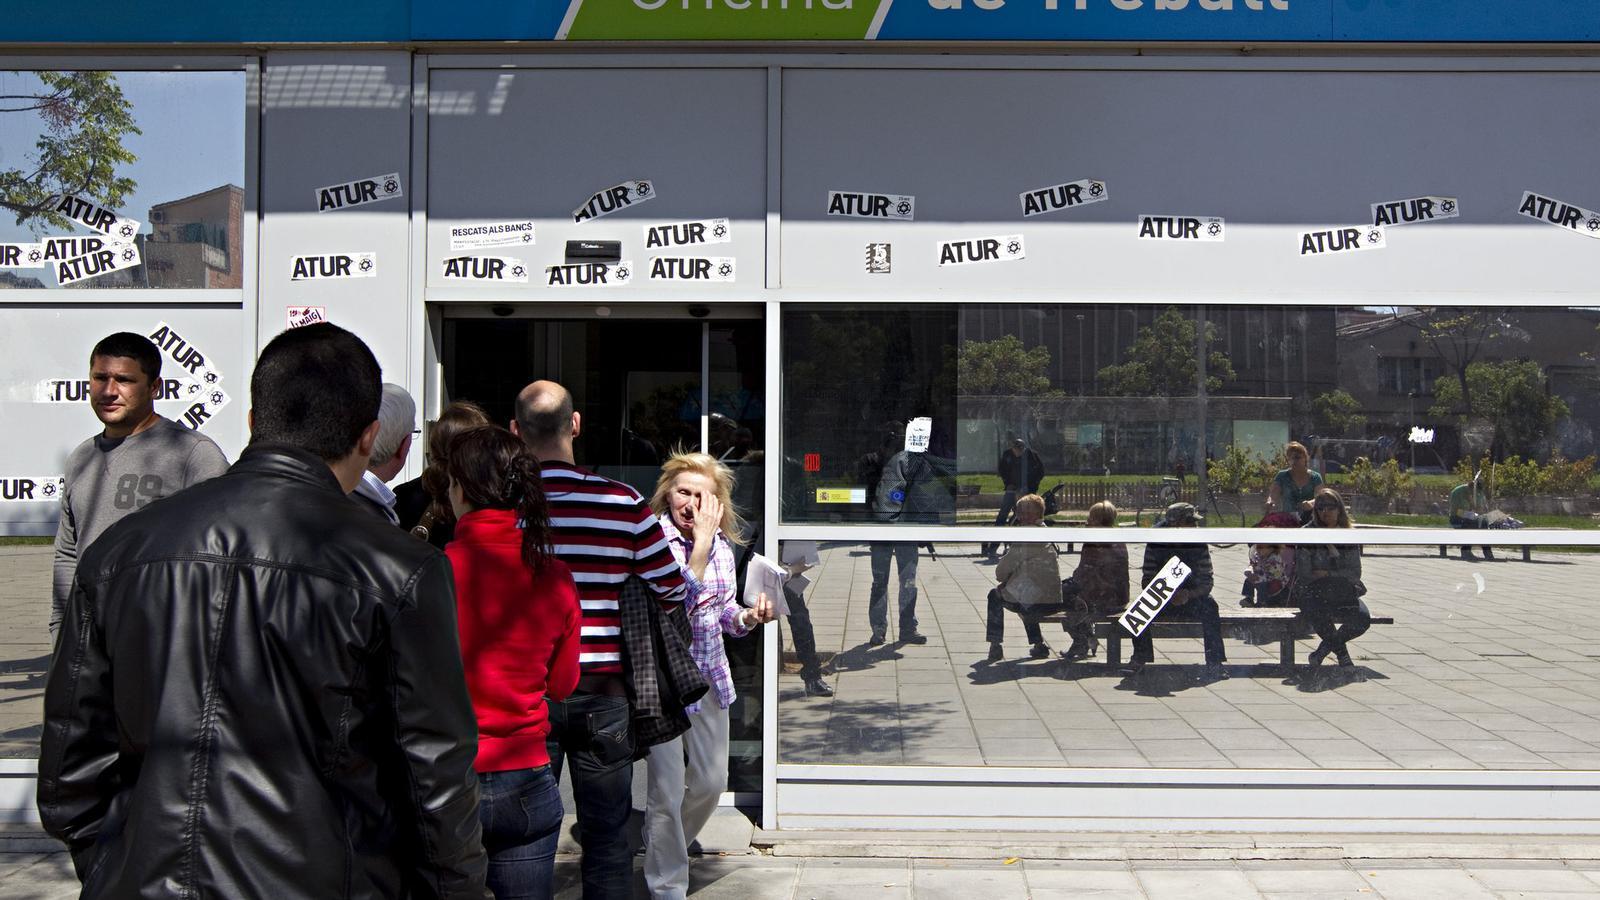 L 39 atur baixa a catalunya mentre davalla la poblaci activa for Oficina atur